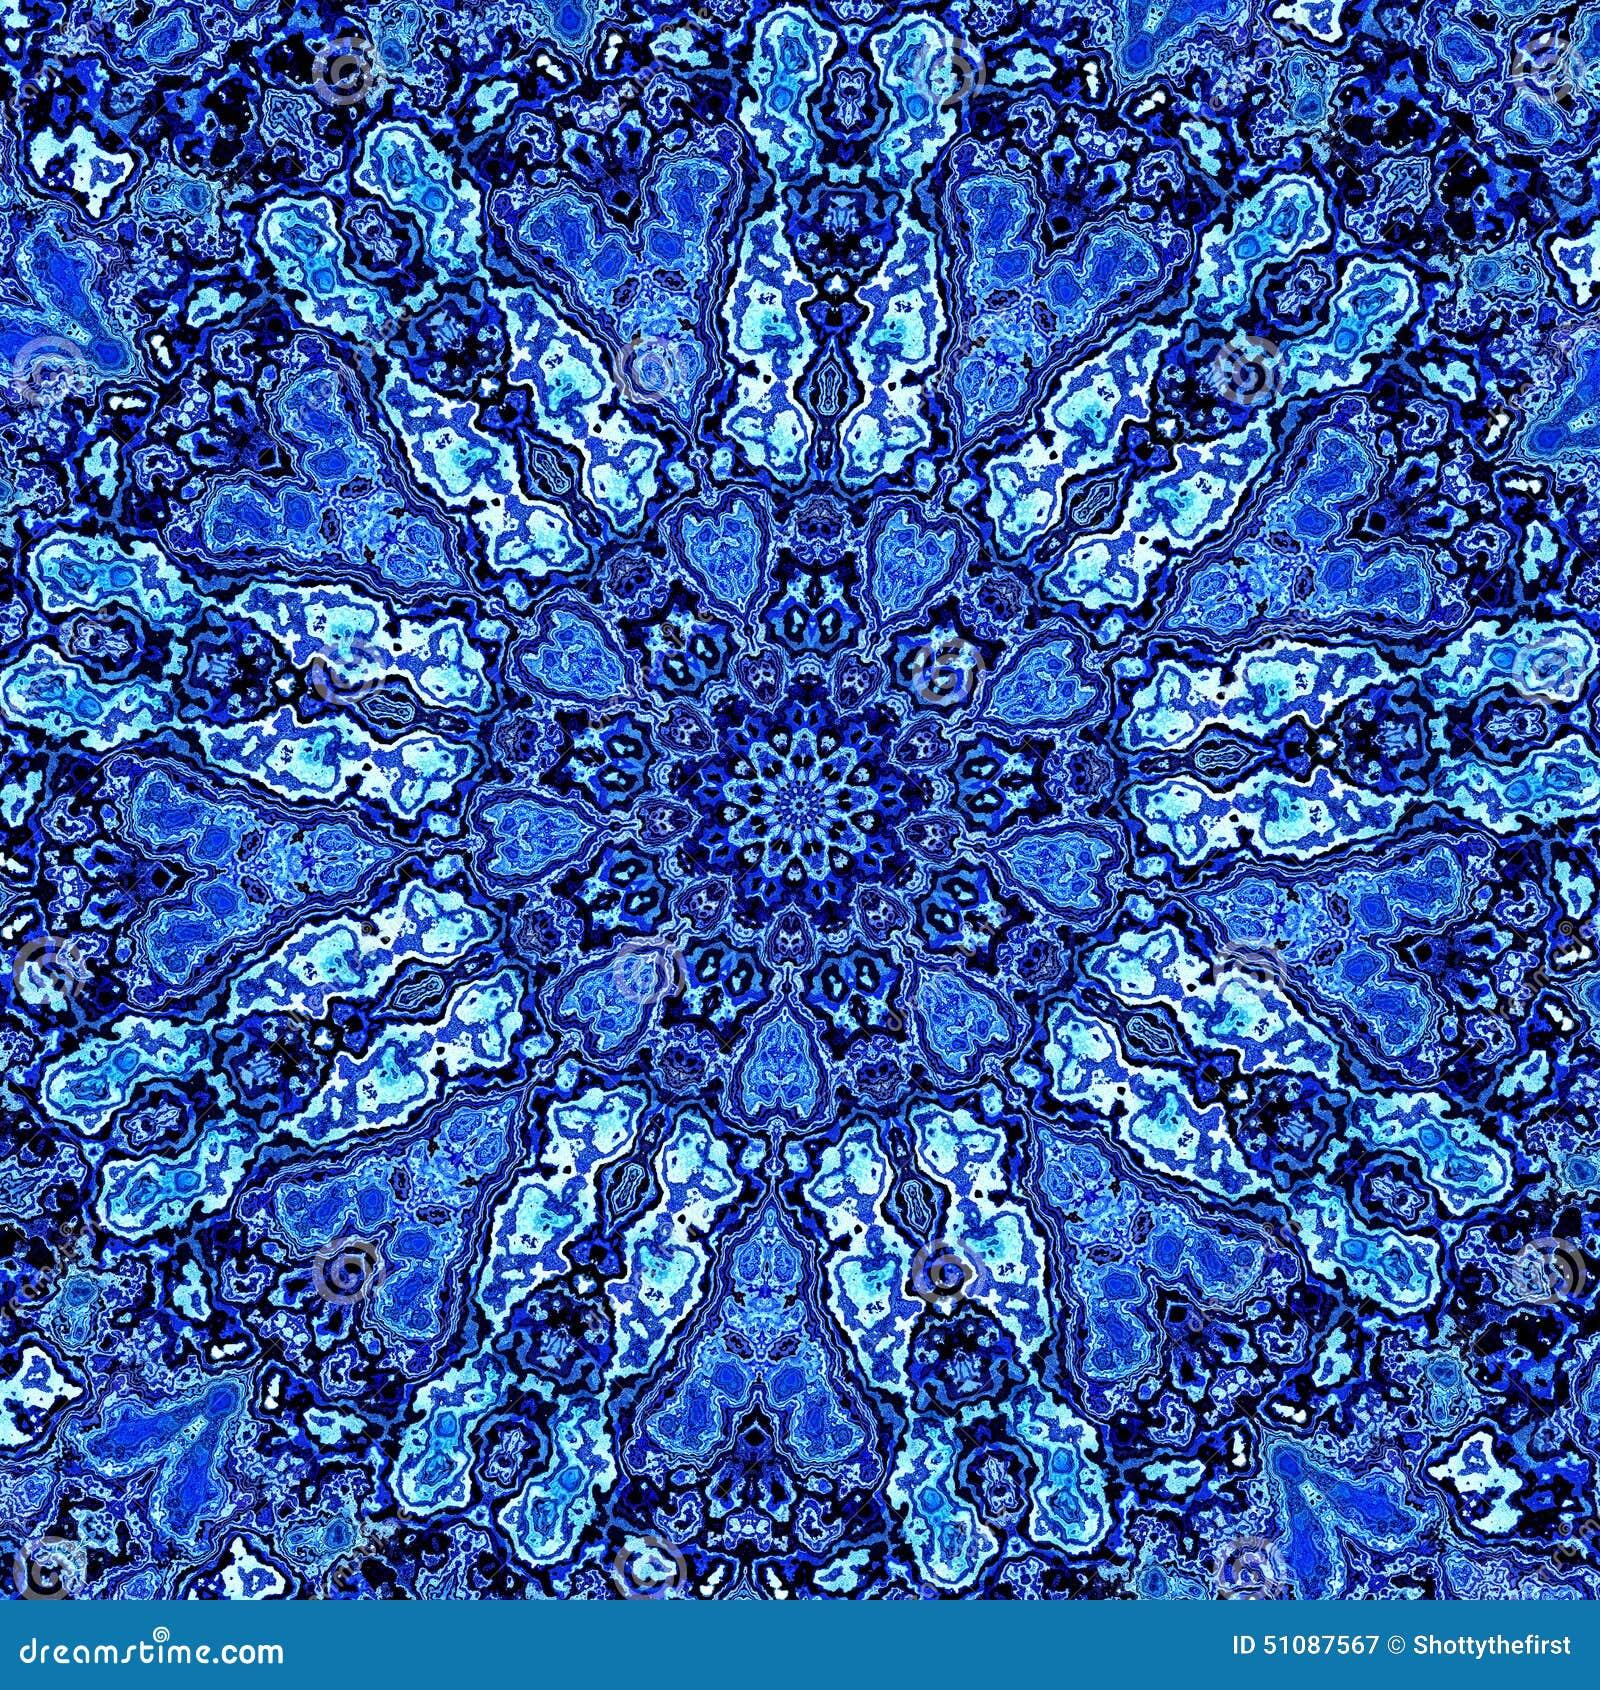 Beautiful Detailed Blue Mandala Fractal. Abstract Background Pattern. Decorative Modern Artwork. Creative Ornate Image. Element.